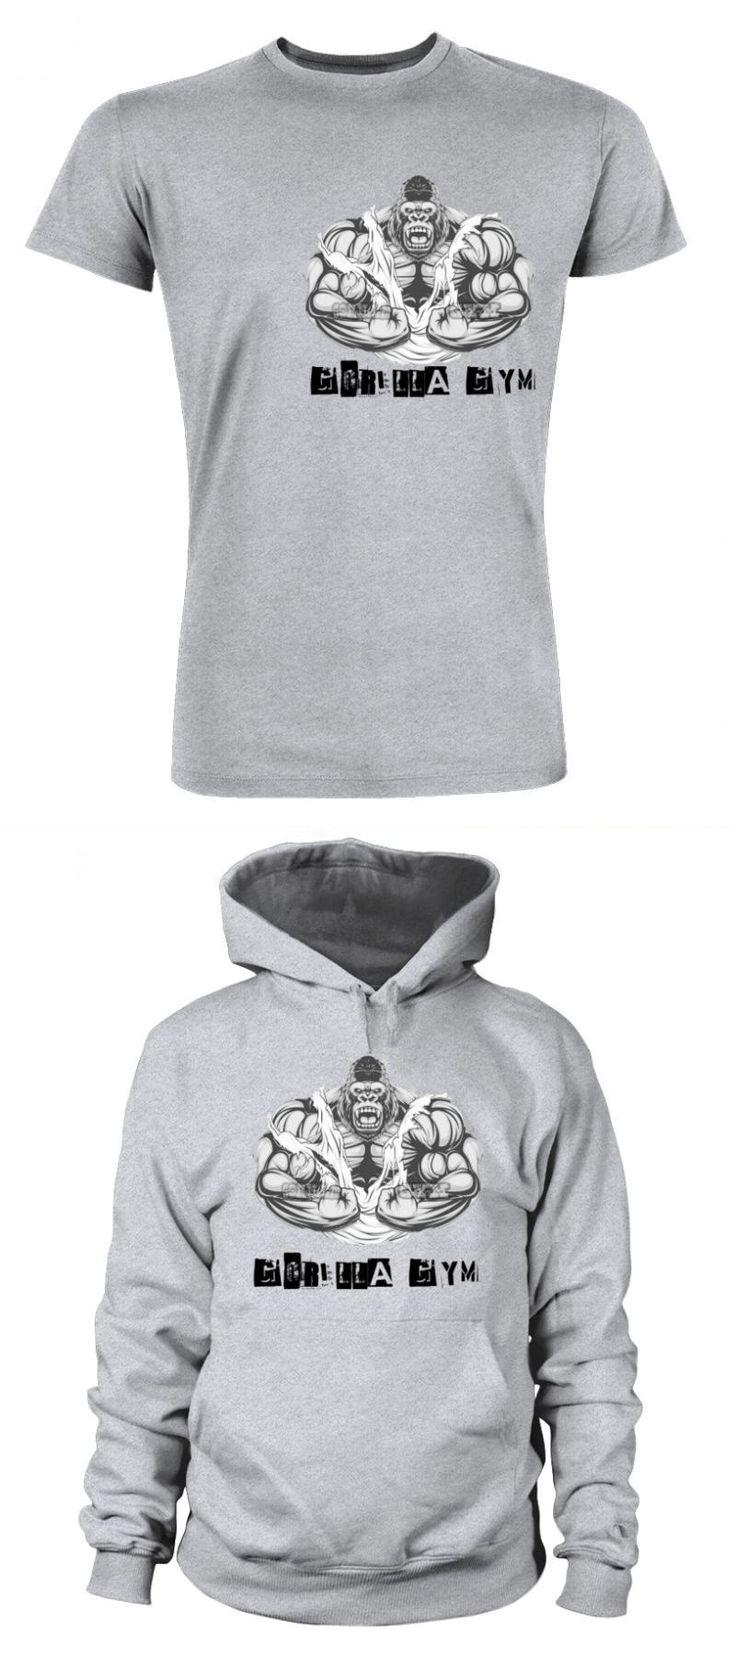 Tee shirt sport de combat edizione limitata modern combat